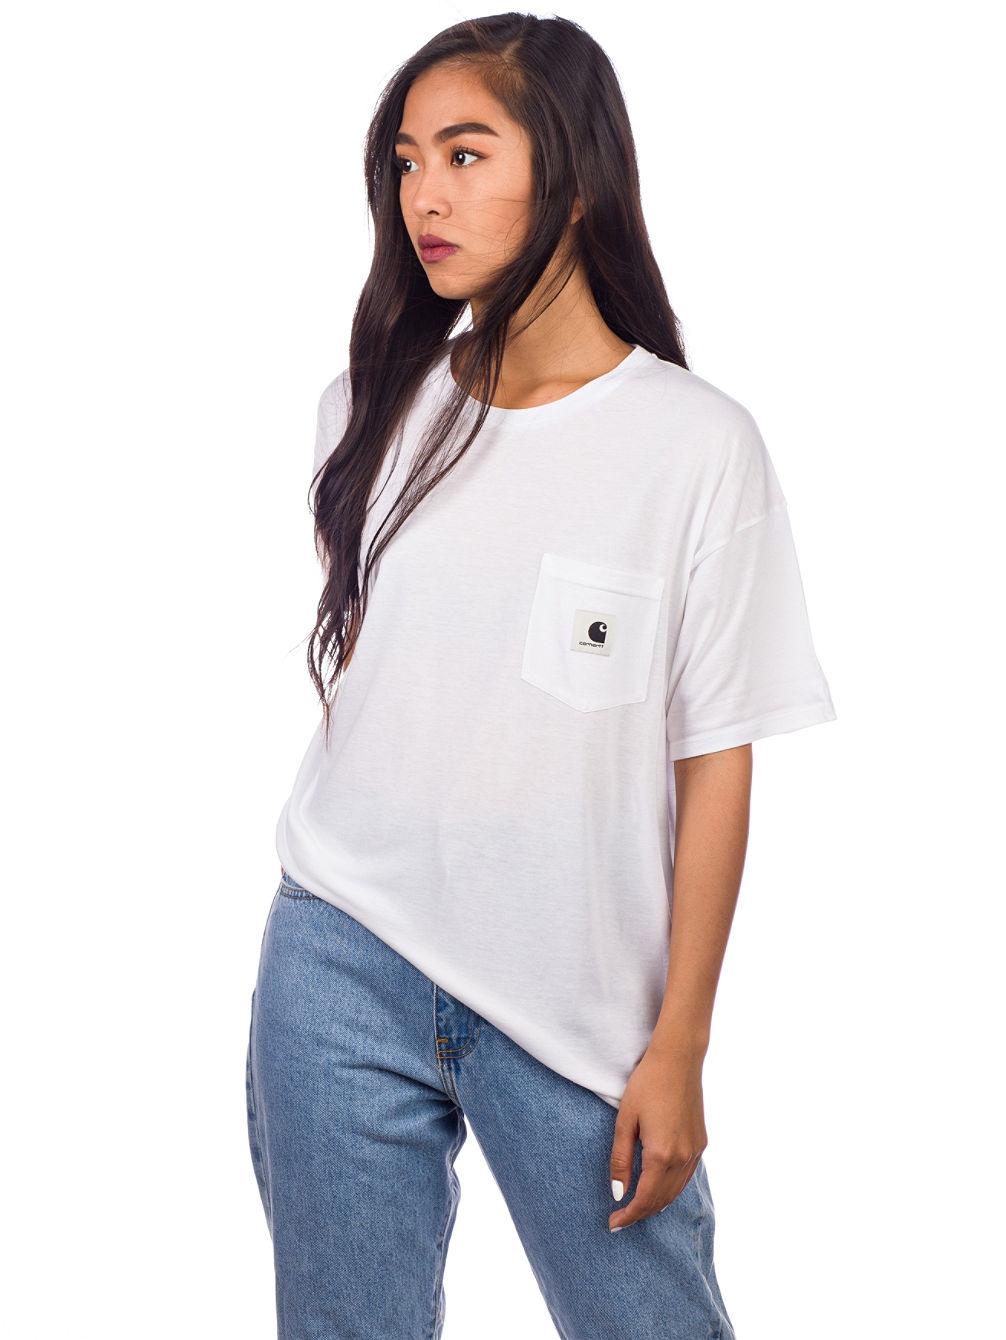 624cbffebce Buy Carhartt WIP Carrie Pocket T-Shirt online at Blue Tomato